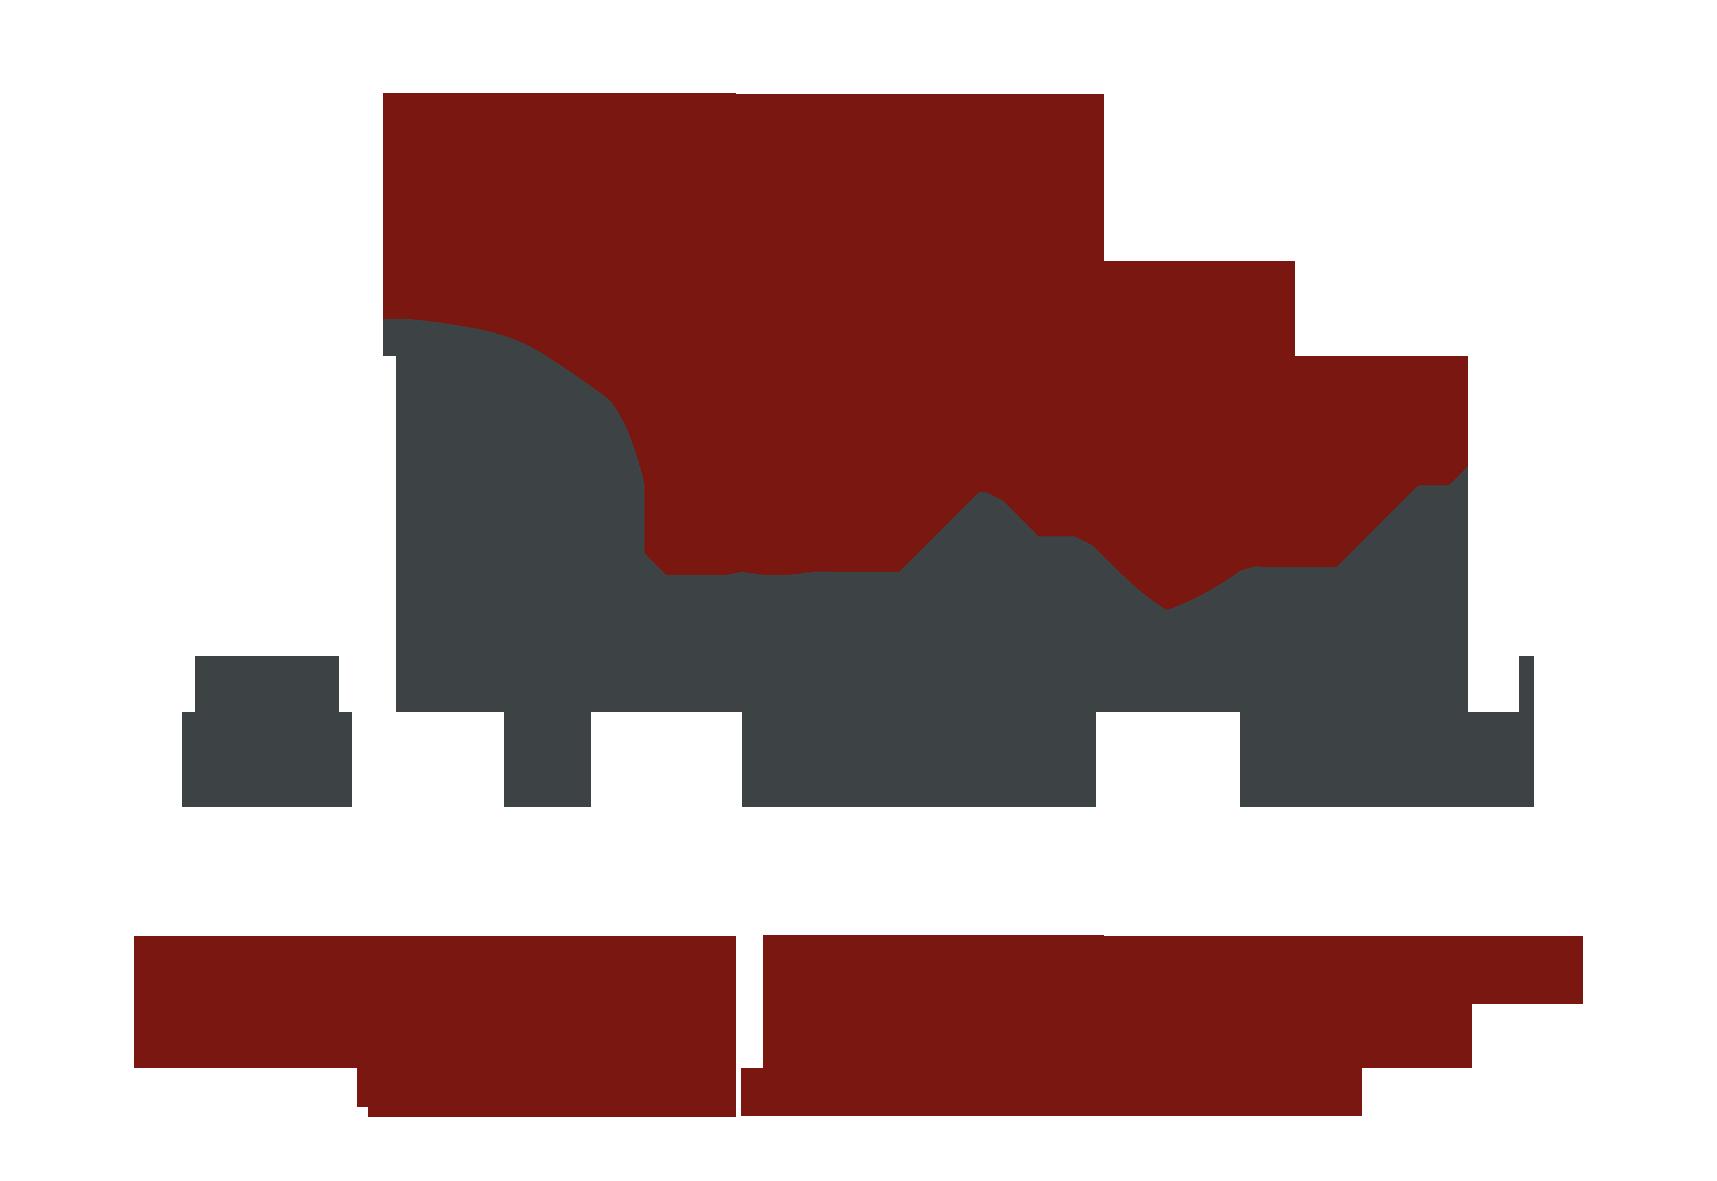 https://www.merxin.com